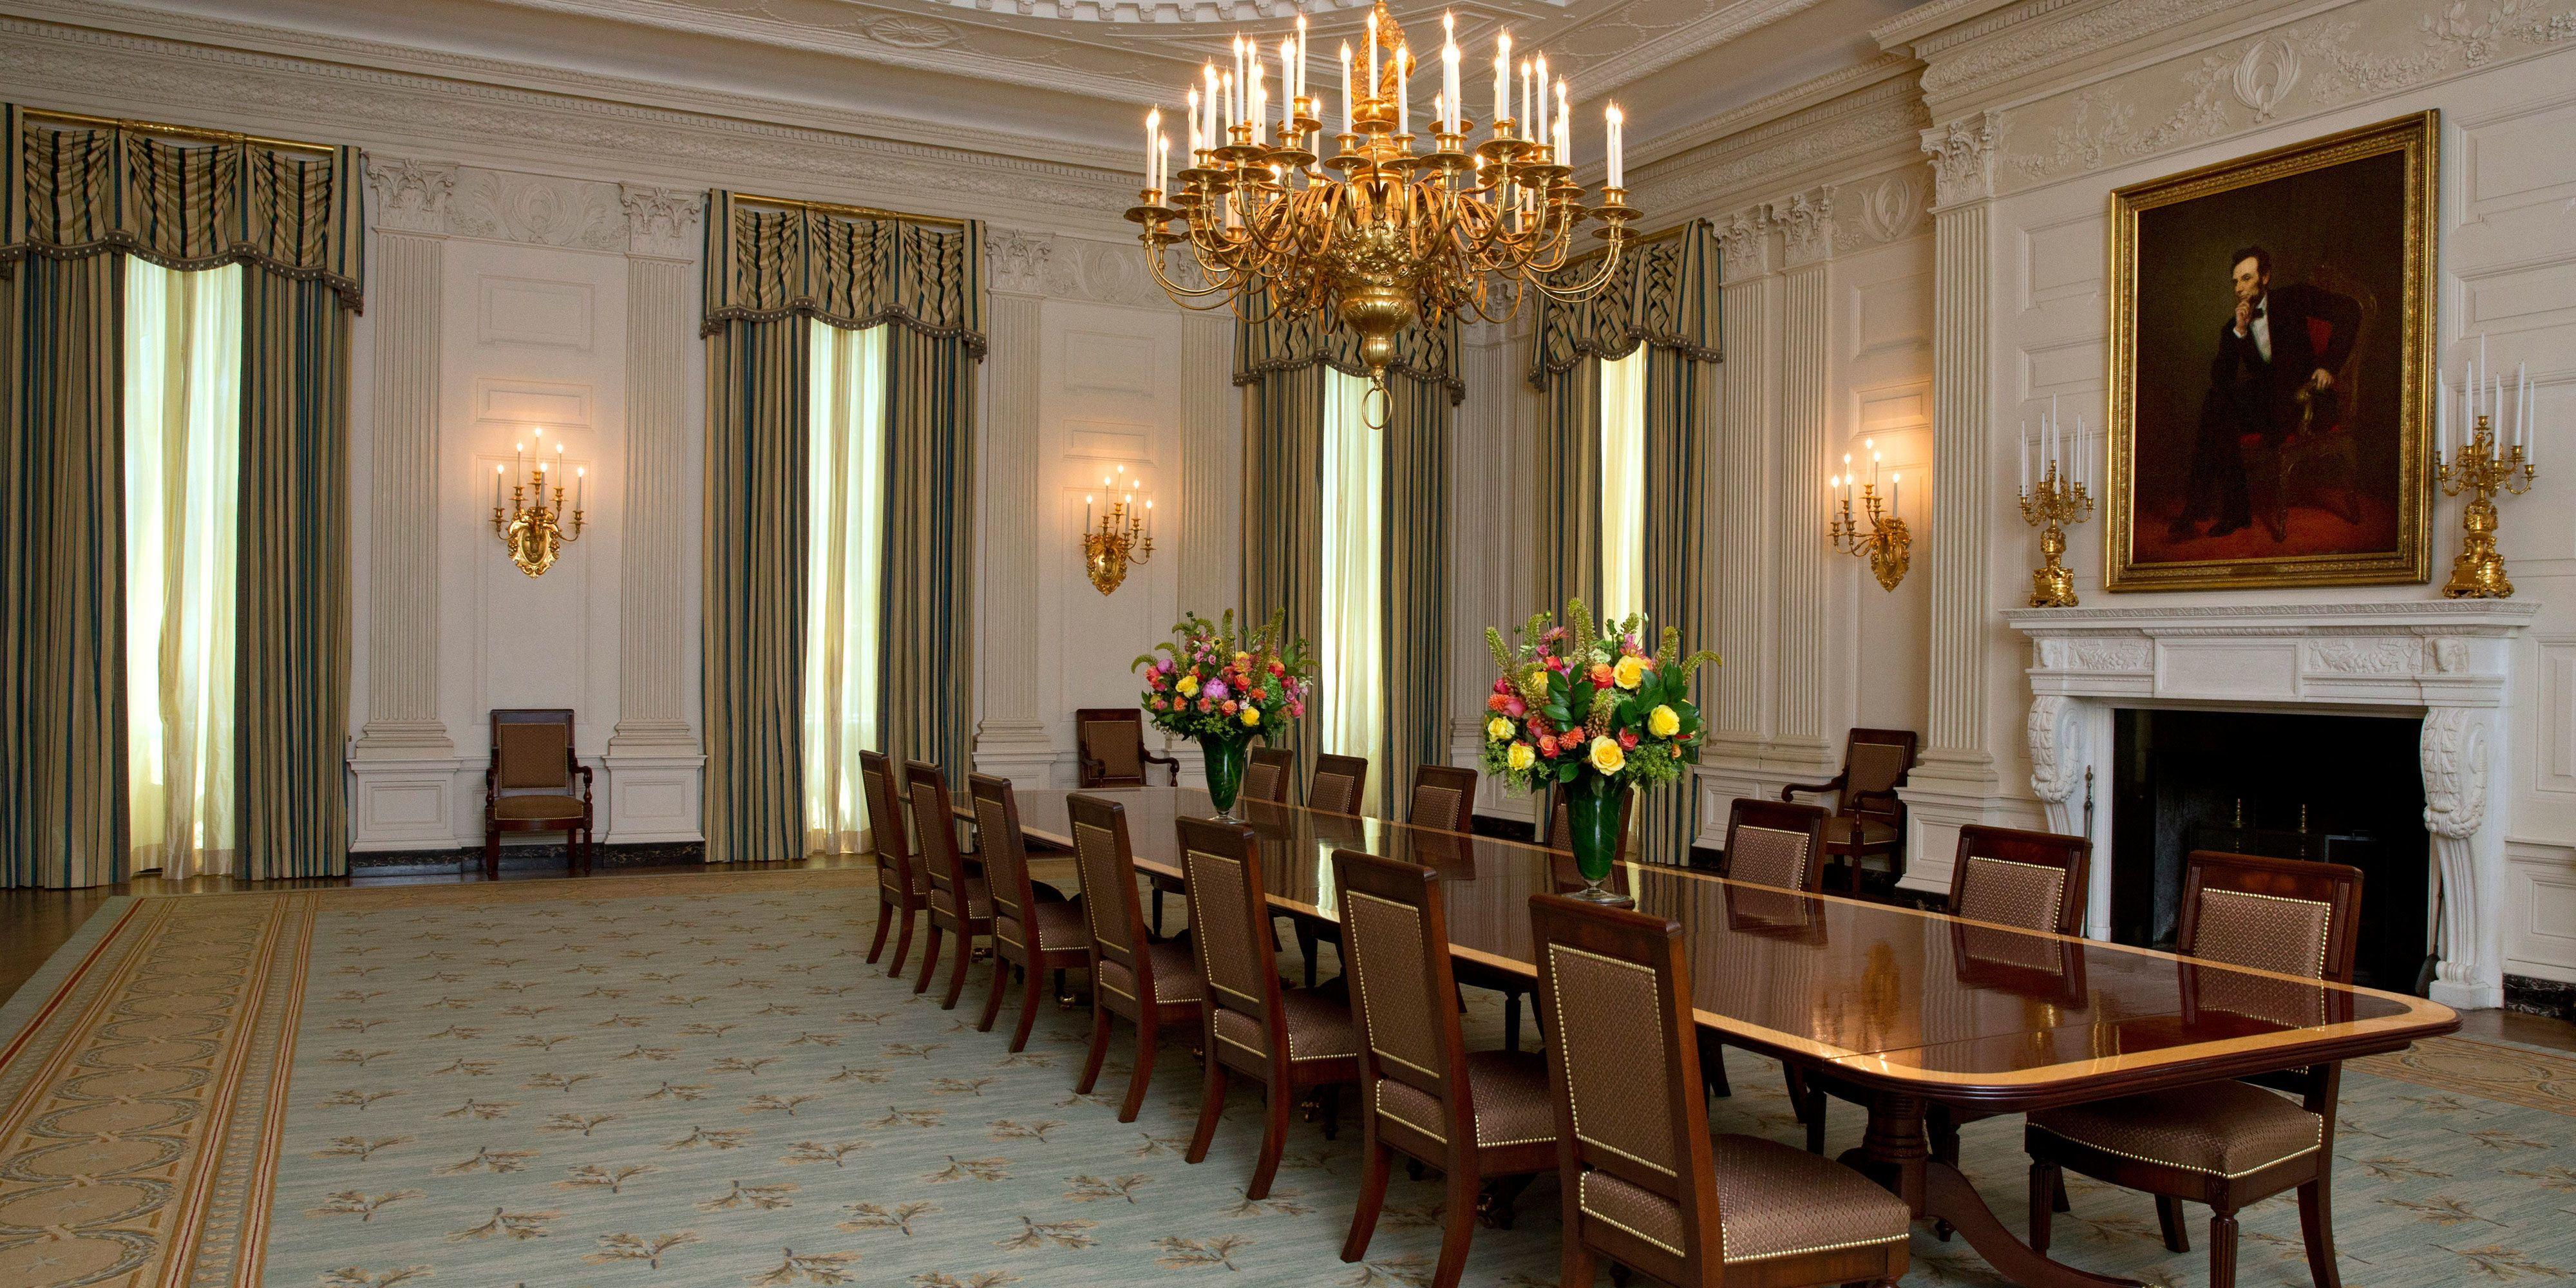 seas cruisetotravel area the grand room entrance dining allure of restaurant grande to